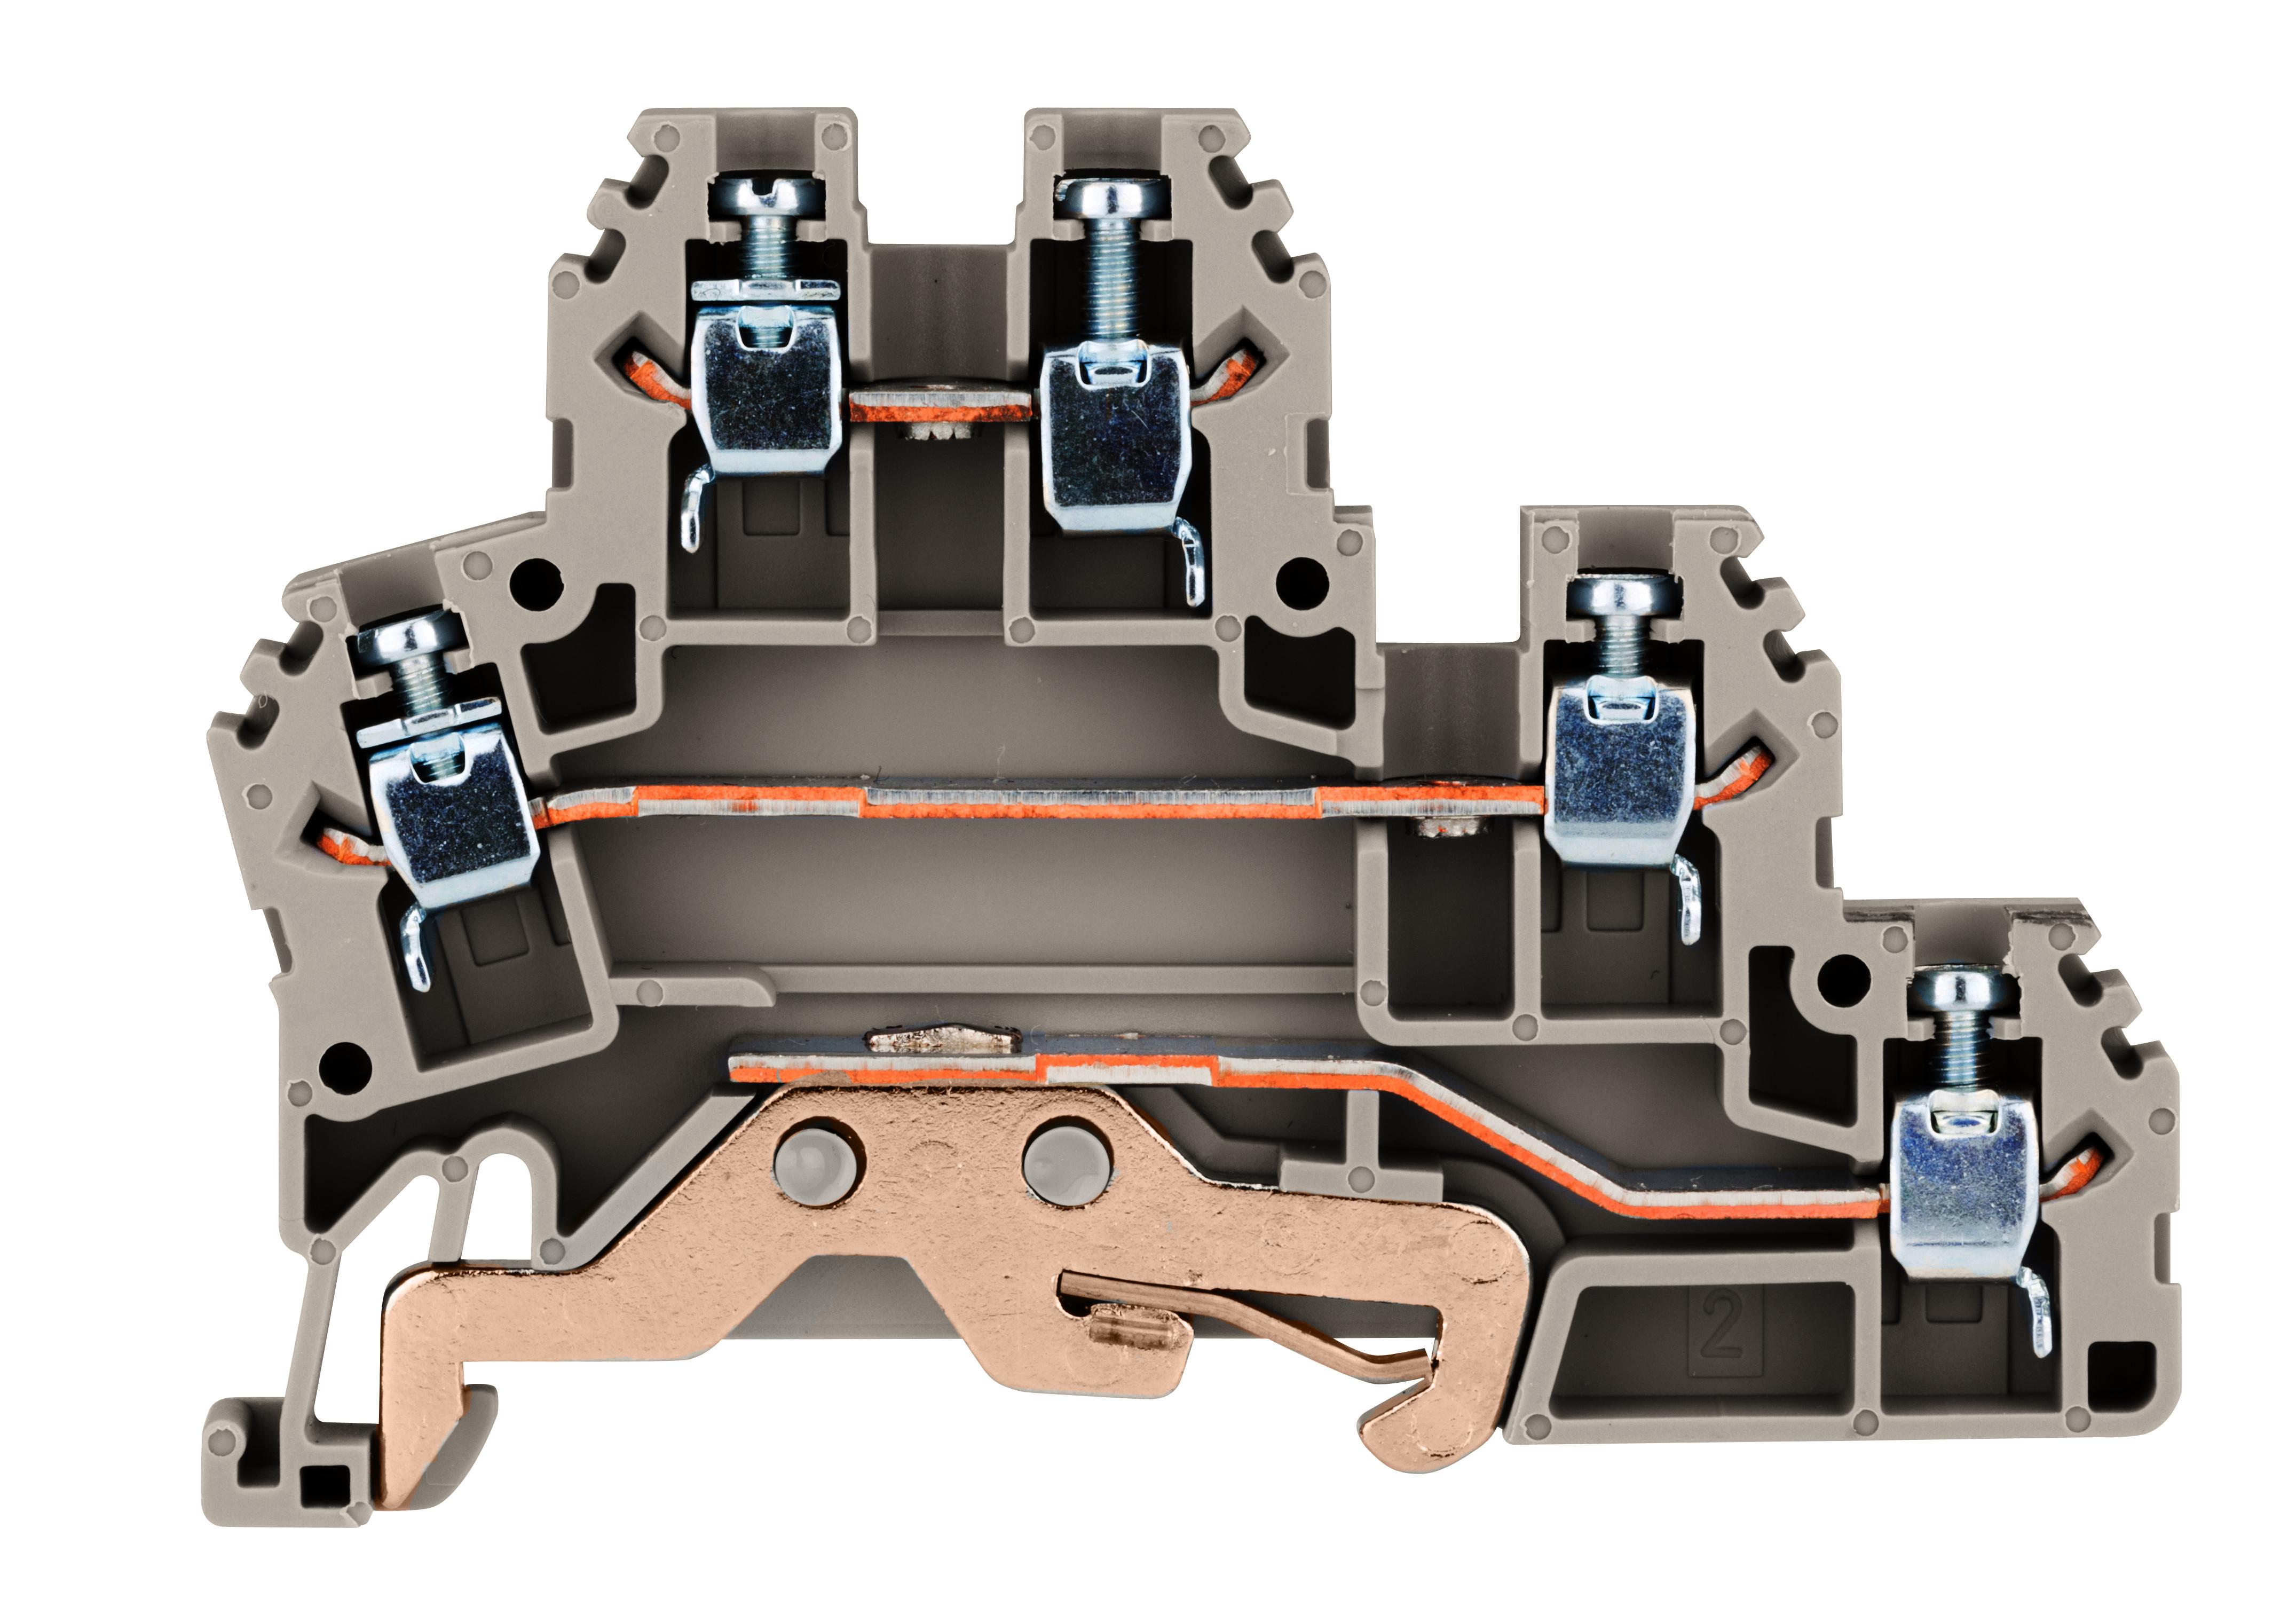 1 Stk Dreistockklemme 2,5mm² (L/L/PE), Type PUK 2 T grau IK680004--